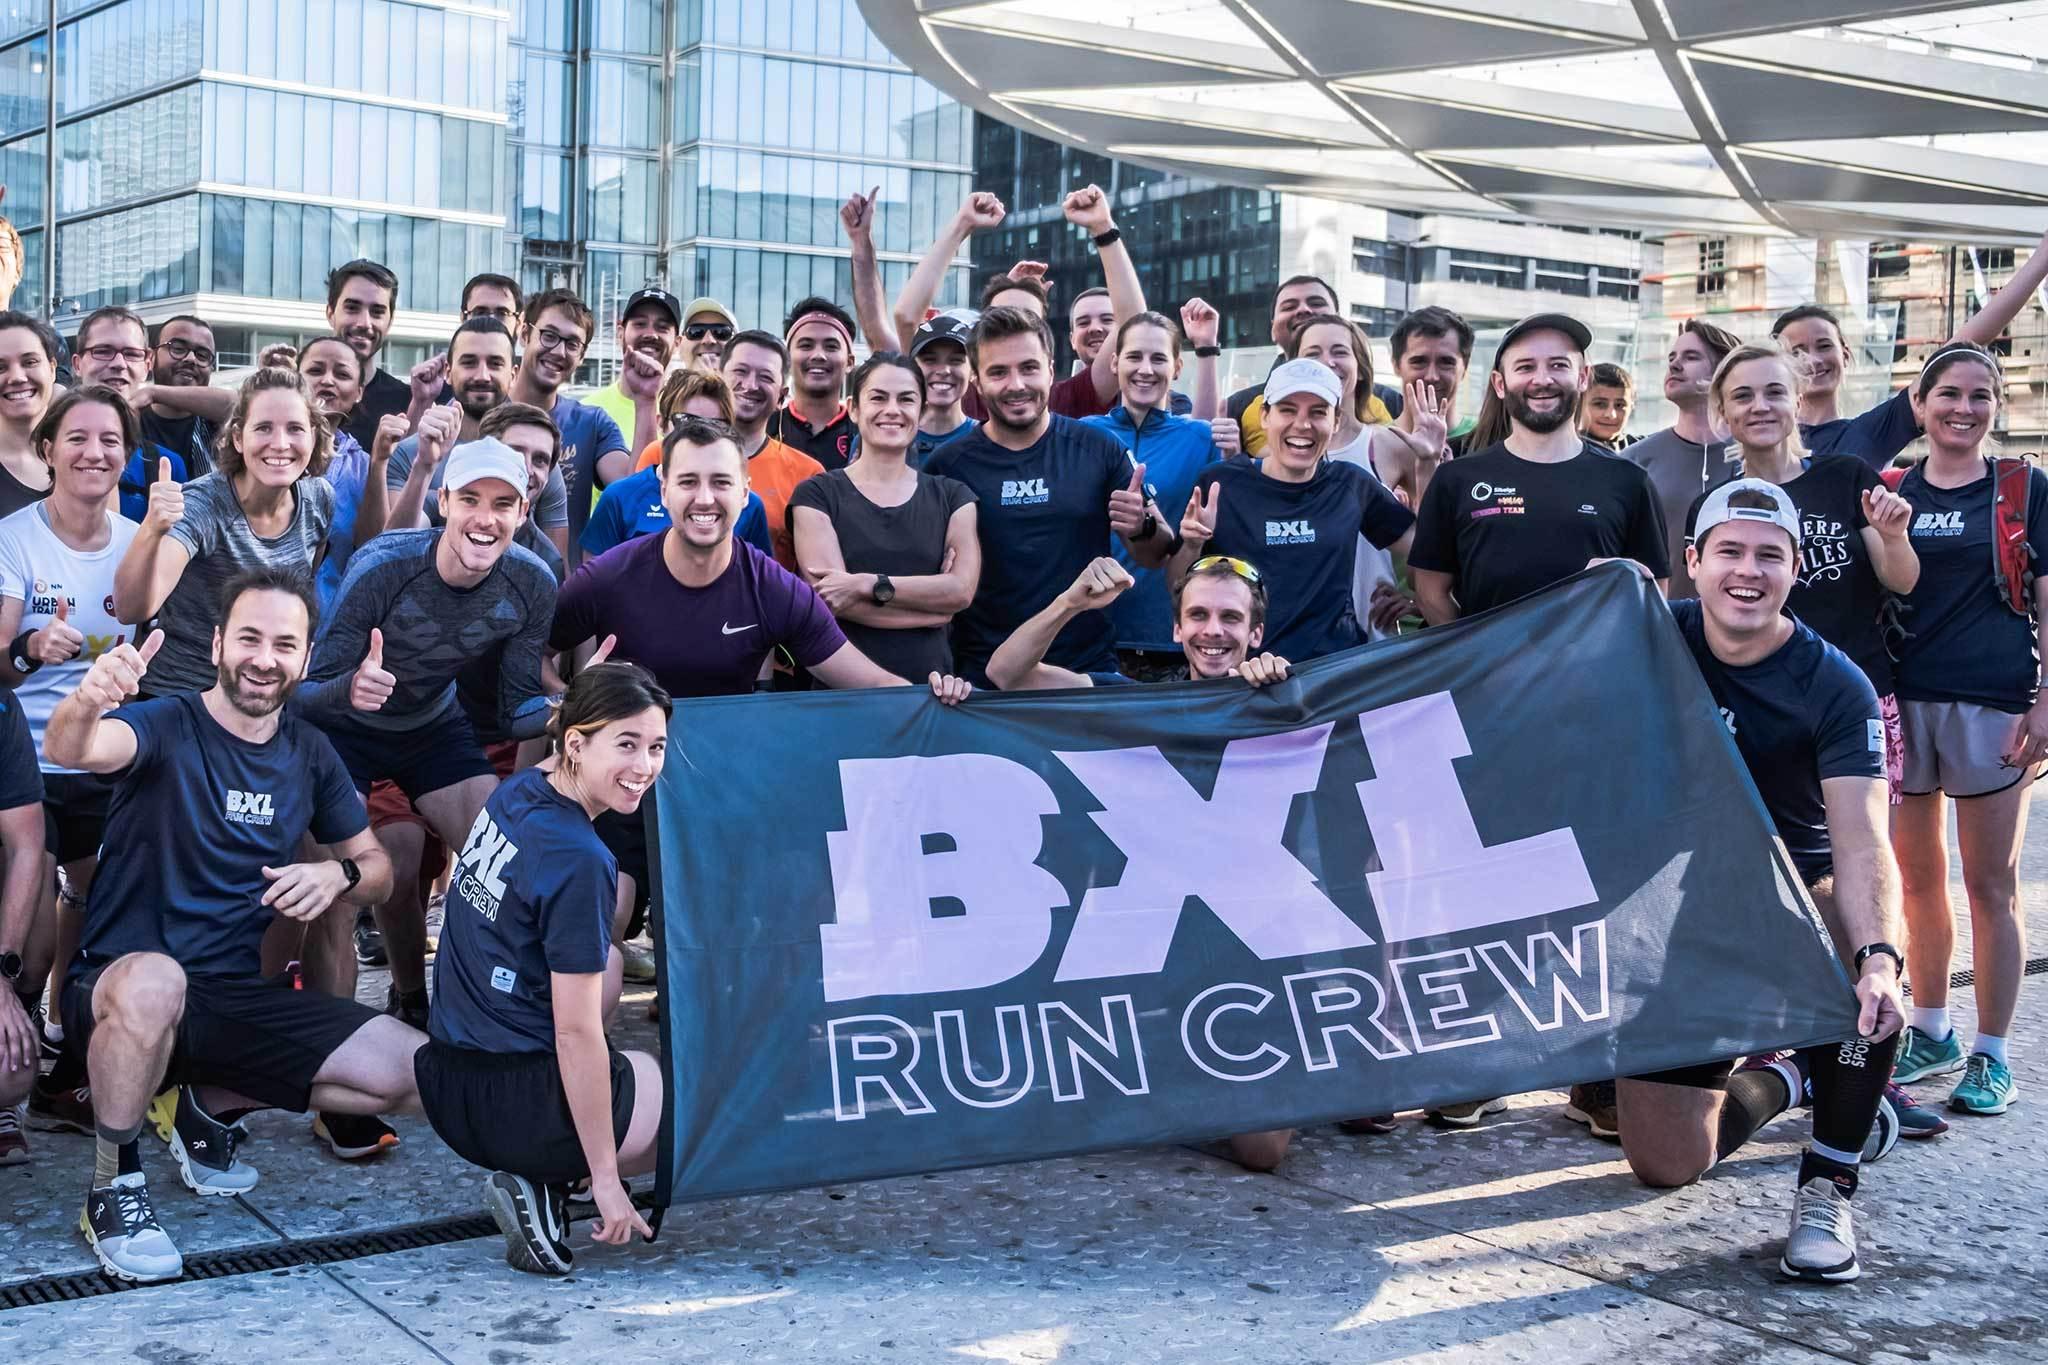 BXL RUN CREW: BRUSSELS